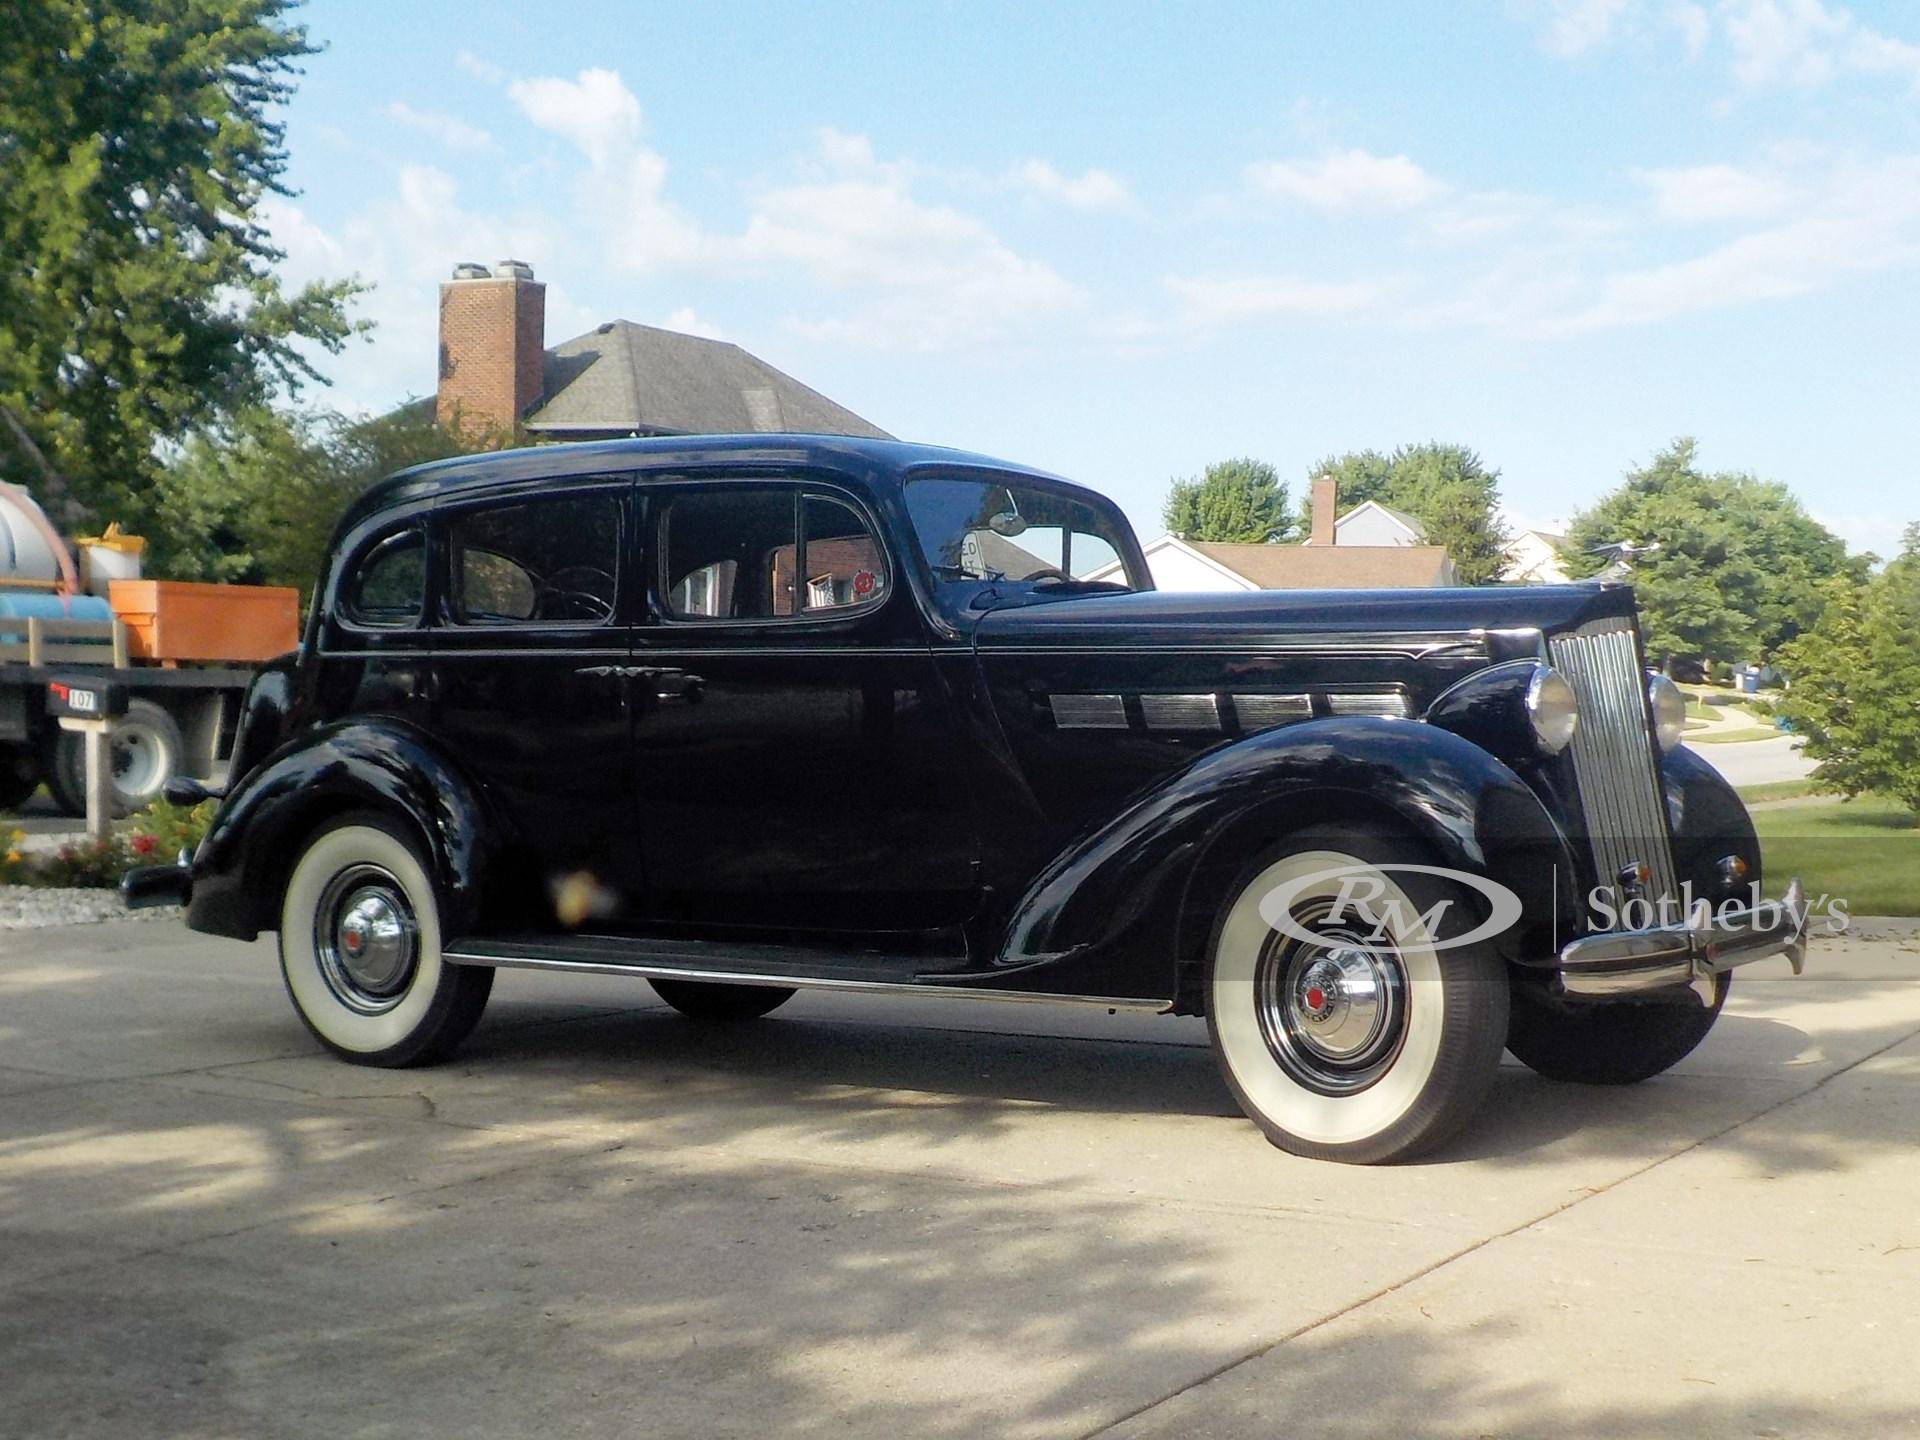 1937 Packard One Twenty Touring Sedan